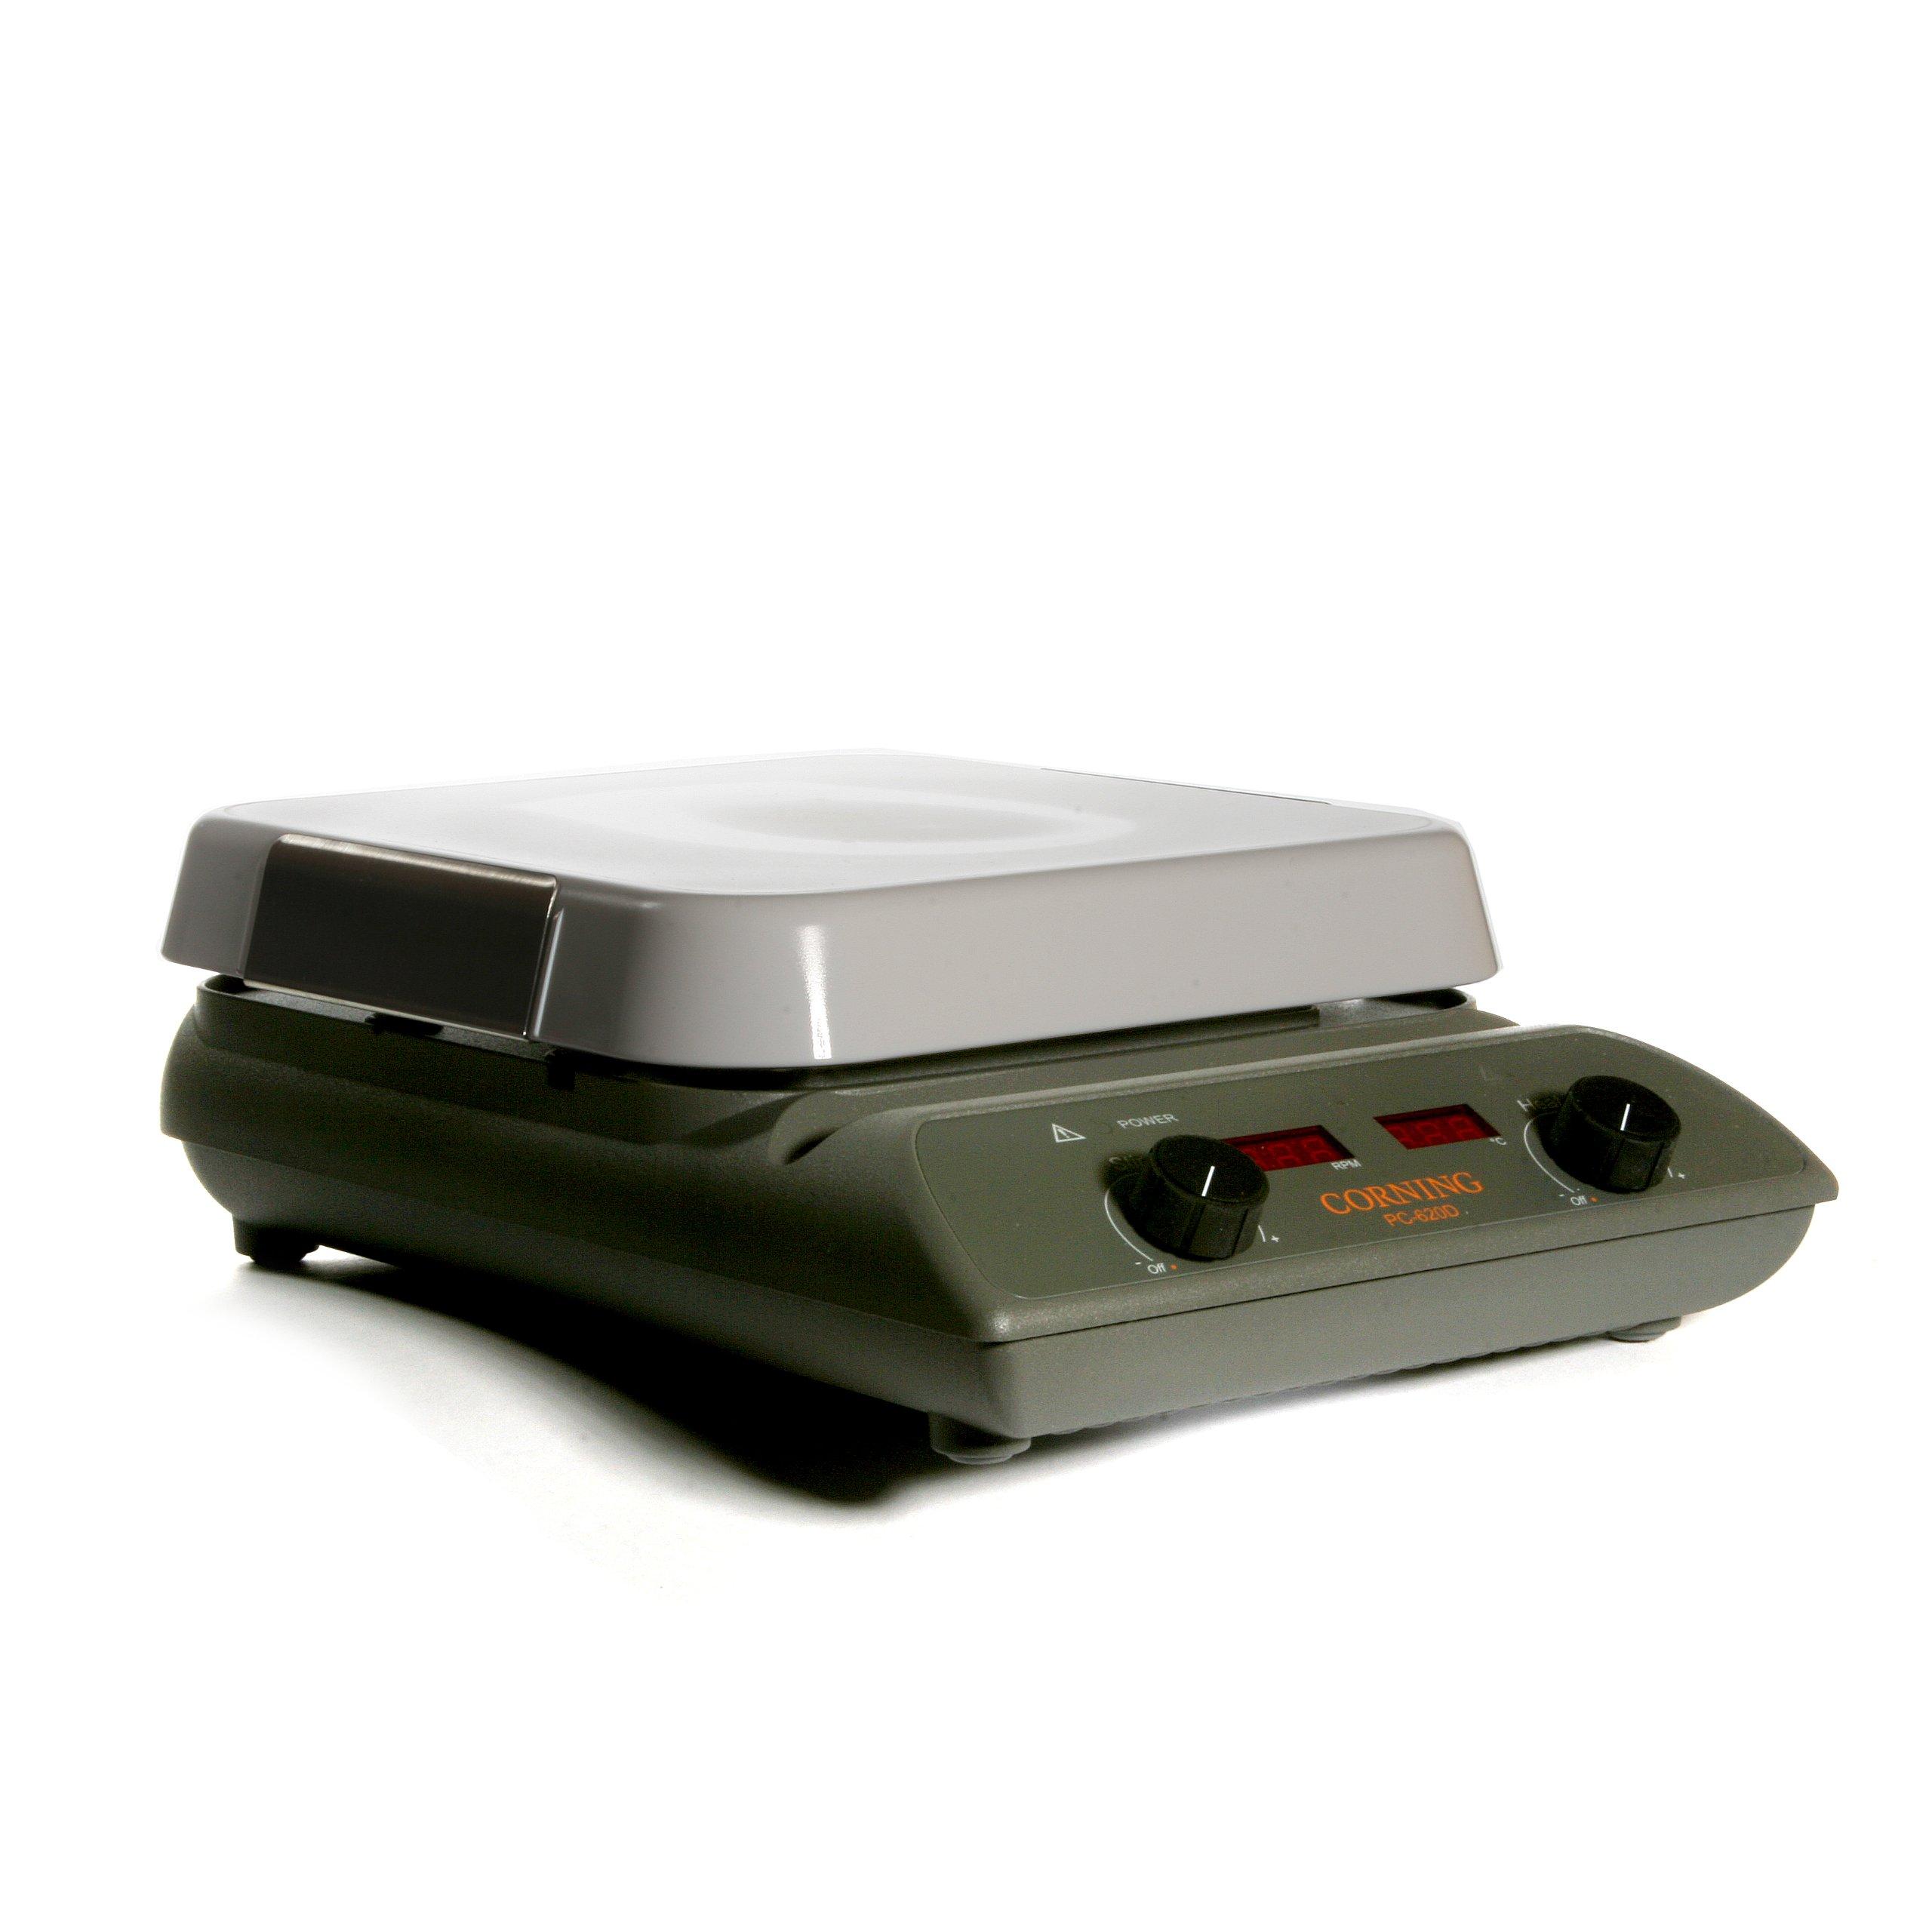 Corning 6795-620D PC-620D Digital Stirring Hot Plate with 10'' x 10'' Pyroceram Top, 40.1cm Length x 26.9cm Width x 12.2cm Height, 5 to 550 Degree C, 120V/60Hz